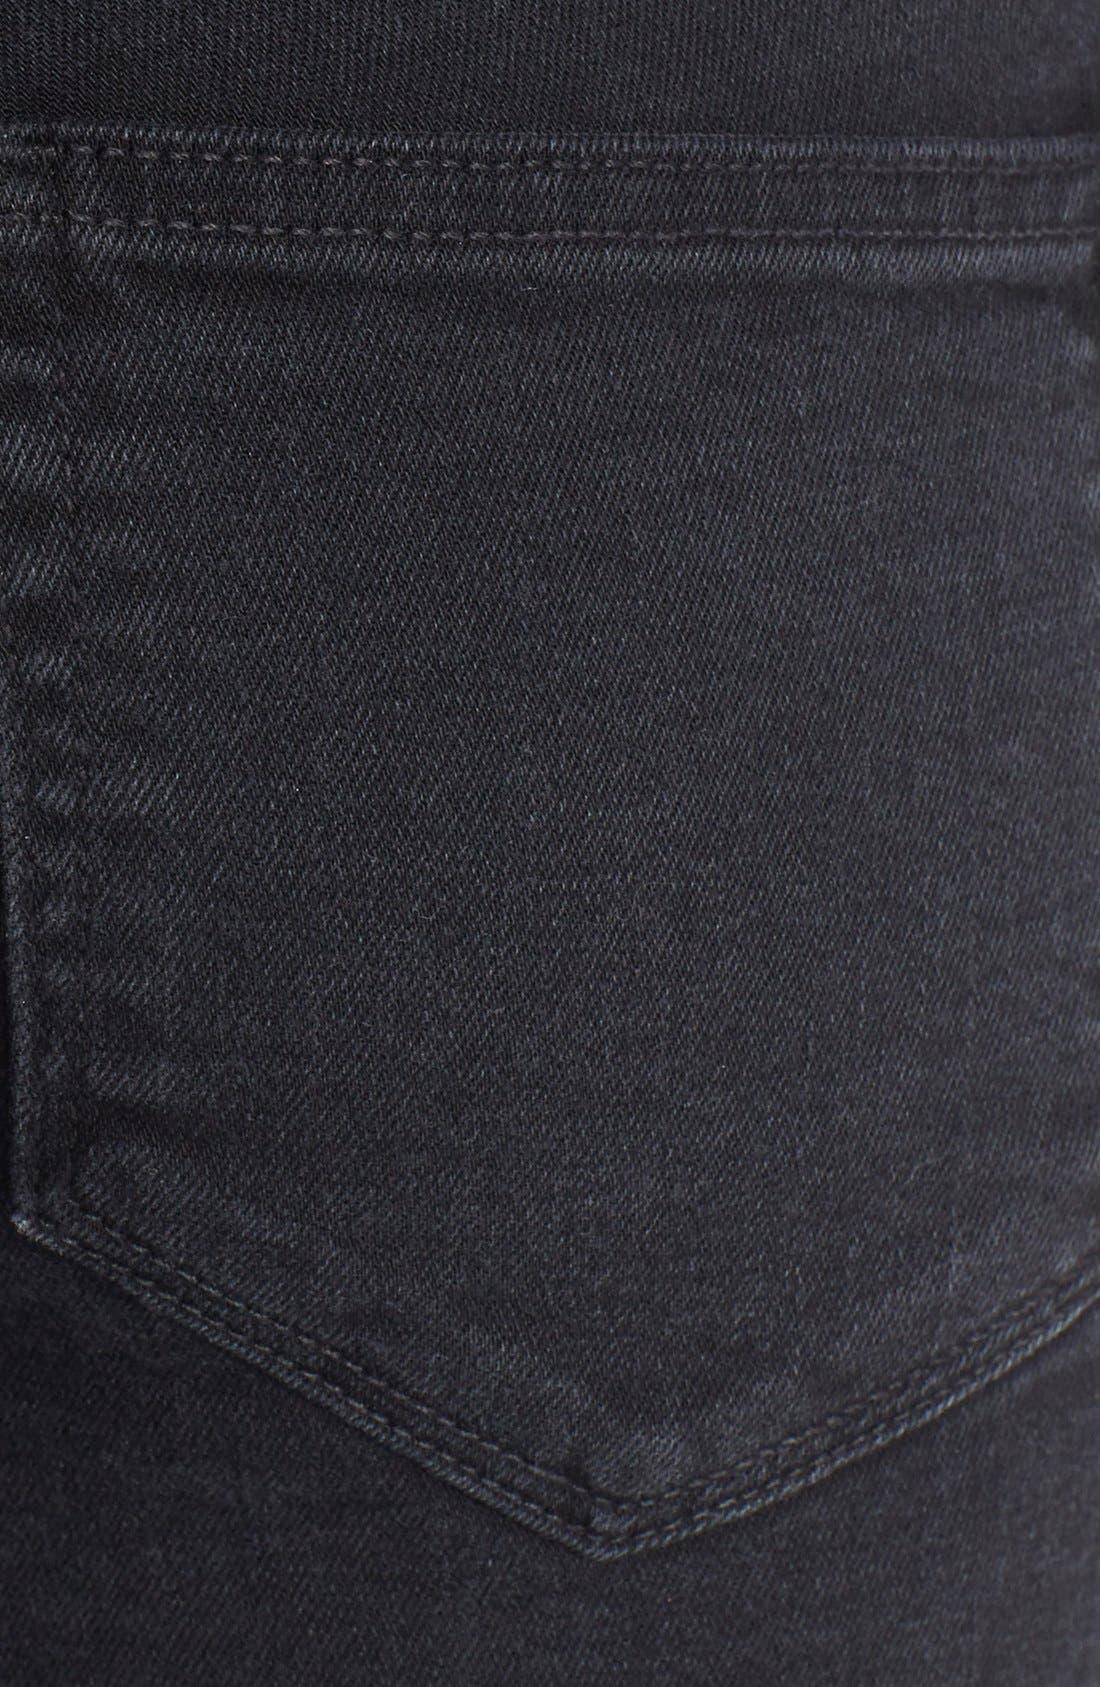 Alternate Image 3  - Paige Denim 'Indio' Zip Detail Skinny Jeans (Ramone Destructed)